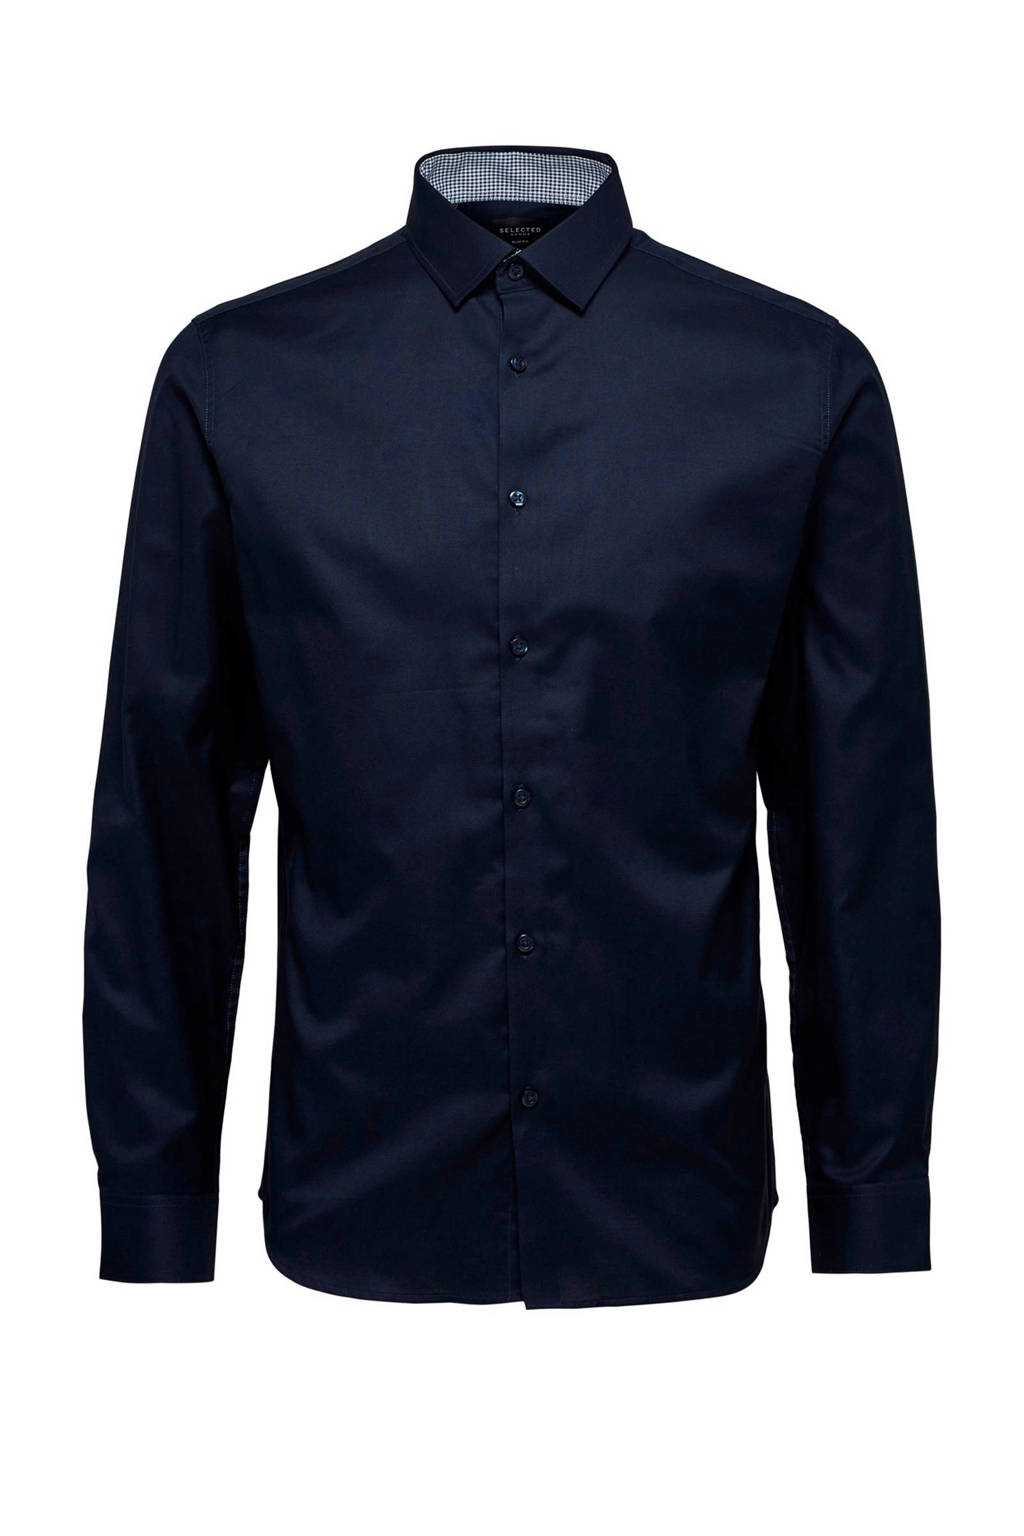 Selected Homme +Fit regular fit overhemd marine, Marine